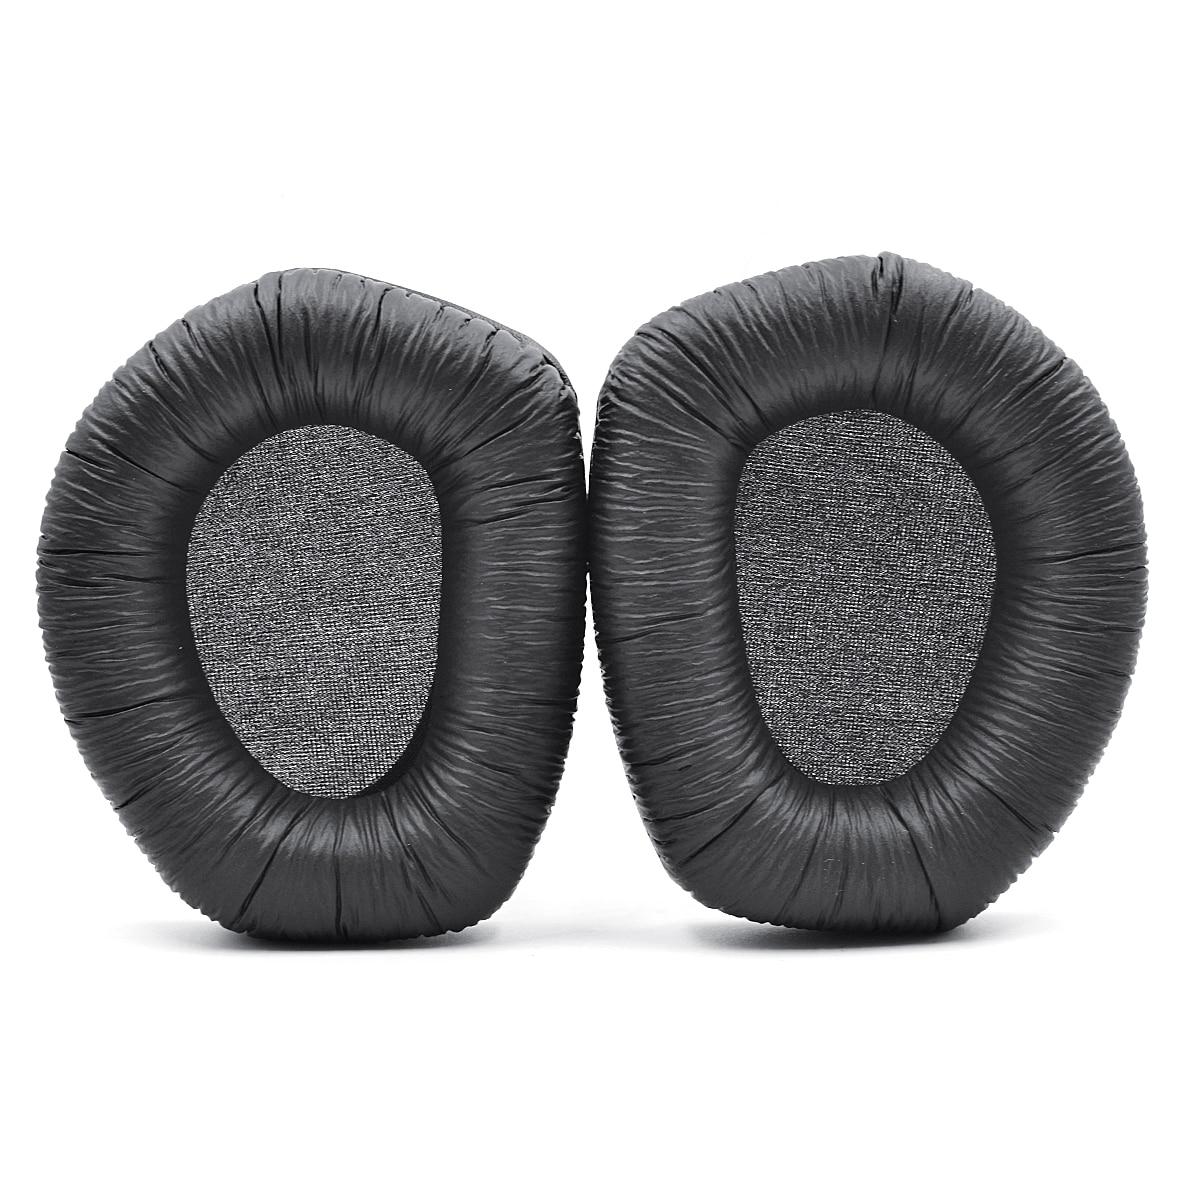 Almohadillas para la cabeza BGWORLD HDR175 HDR195, incluye reemplazo de anillo de plástico para auriculares Sennheiser RS175 RS195